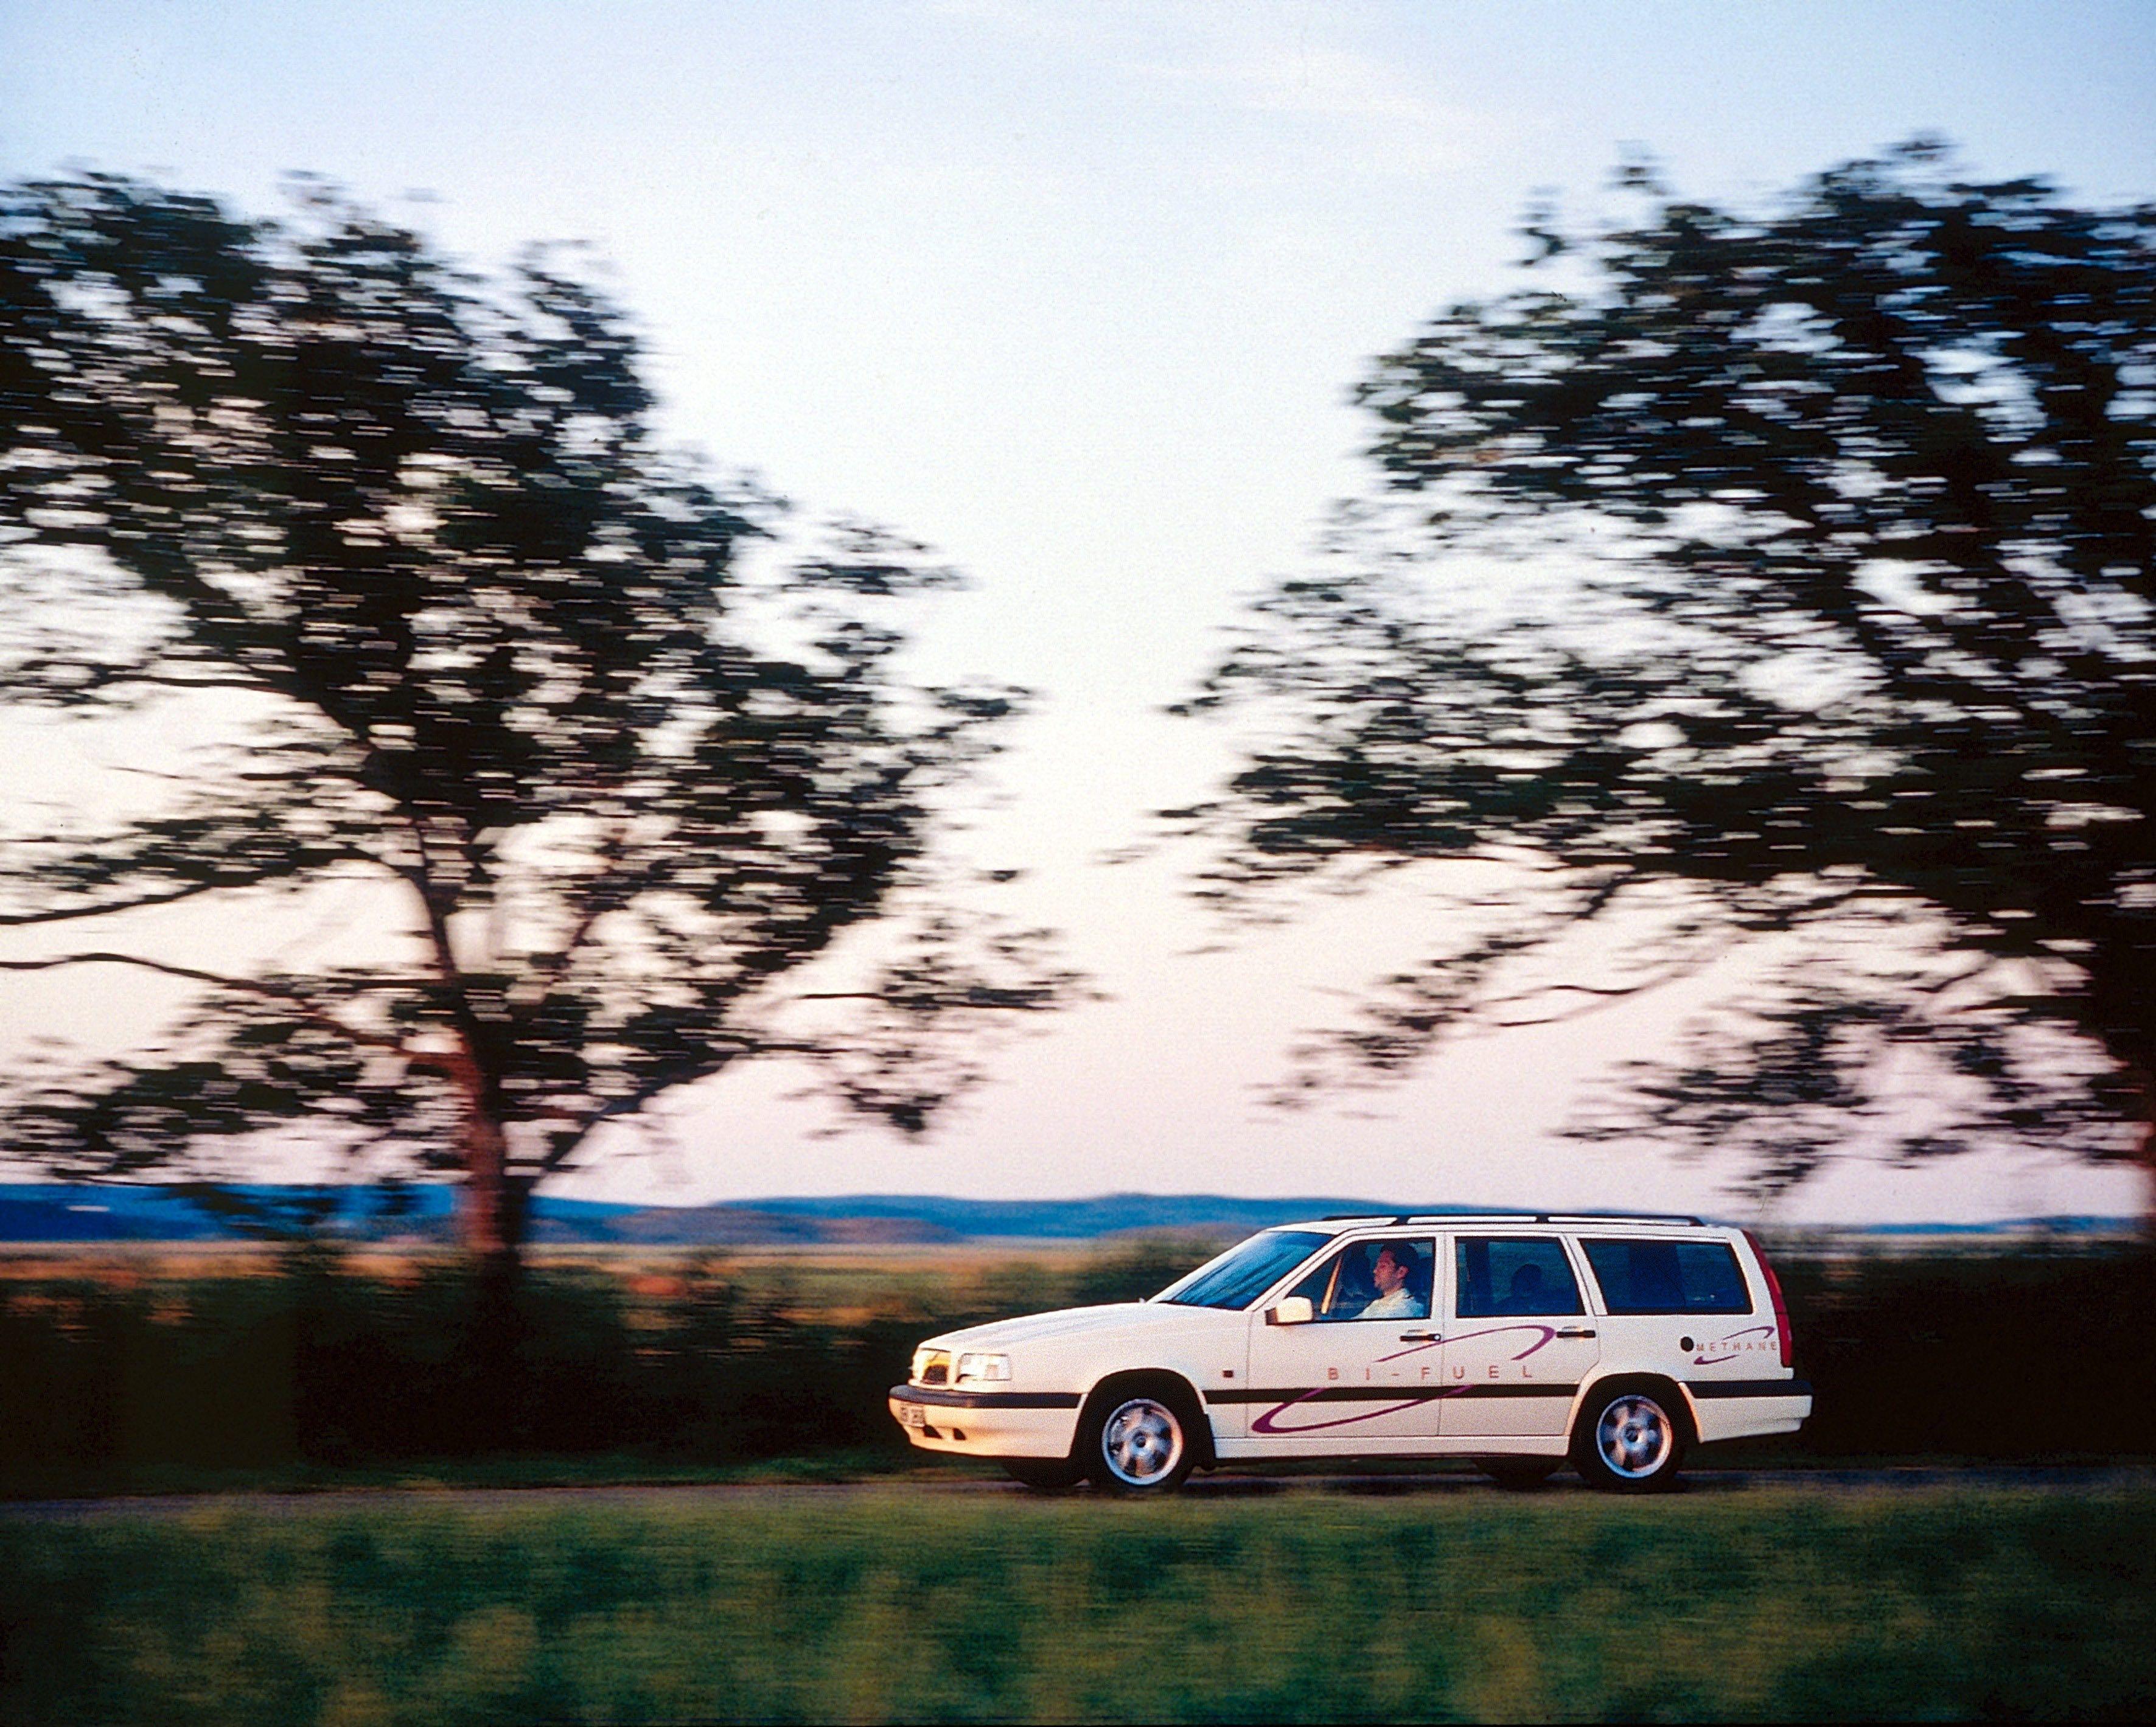 Volvo 850 -  850, 1997, Bi-fuel, Environment, Exterior, Historical, Images